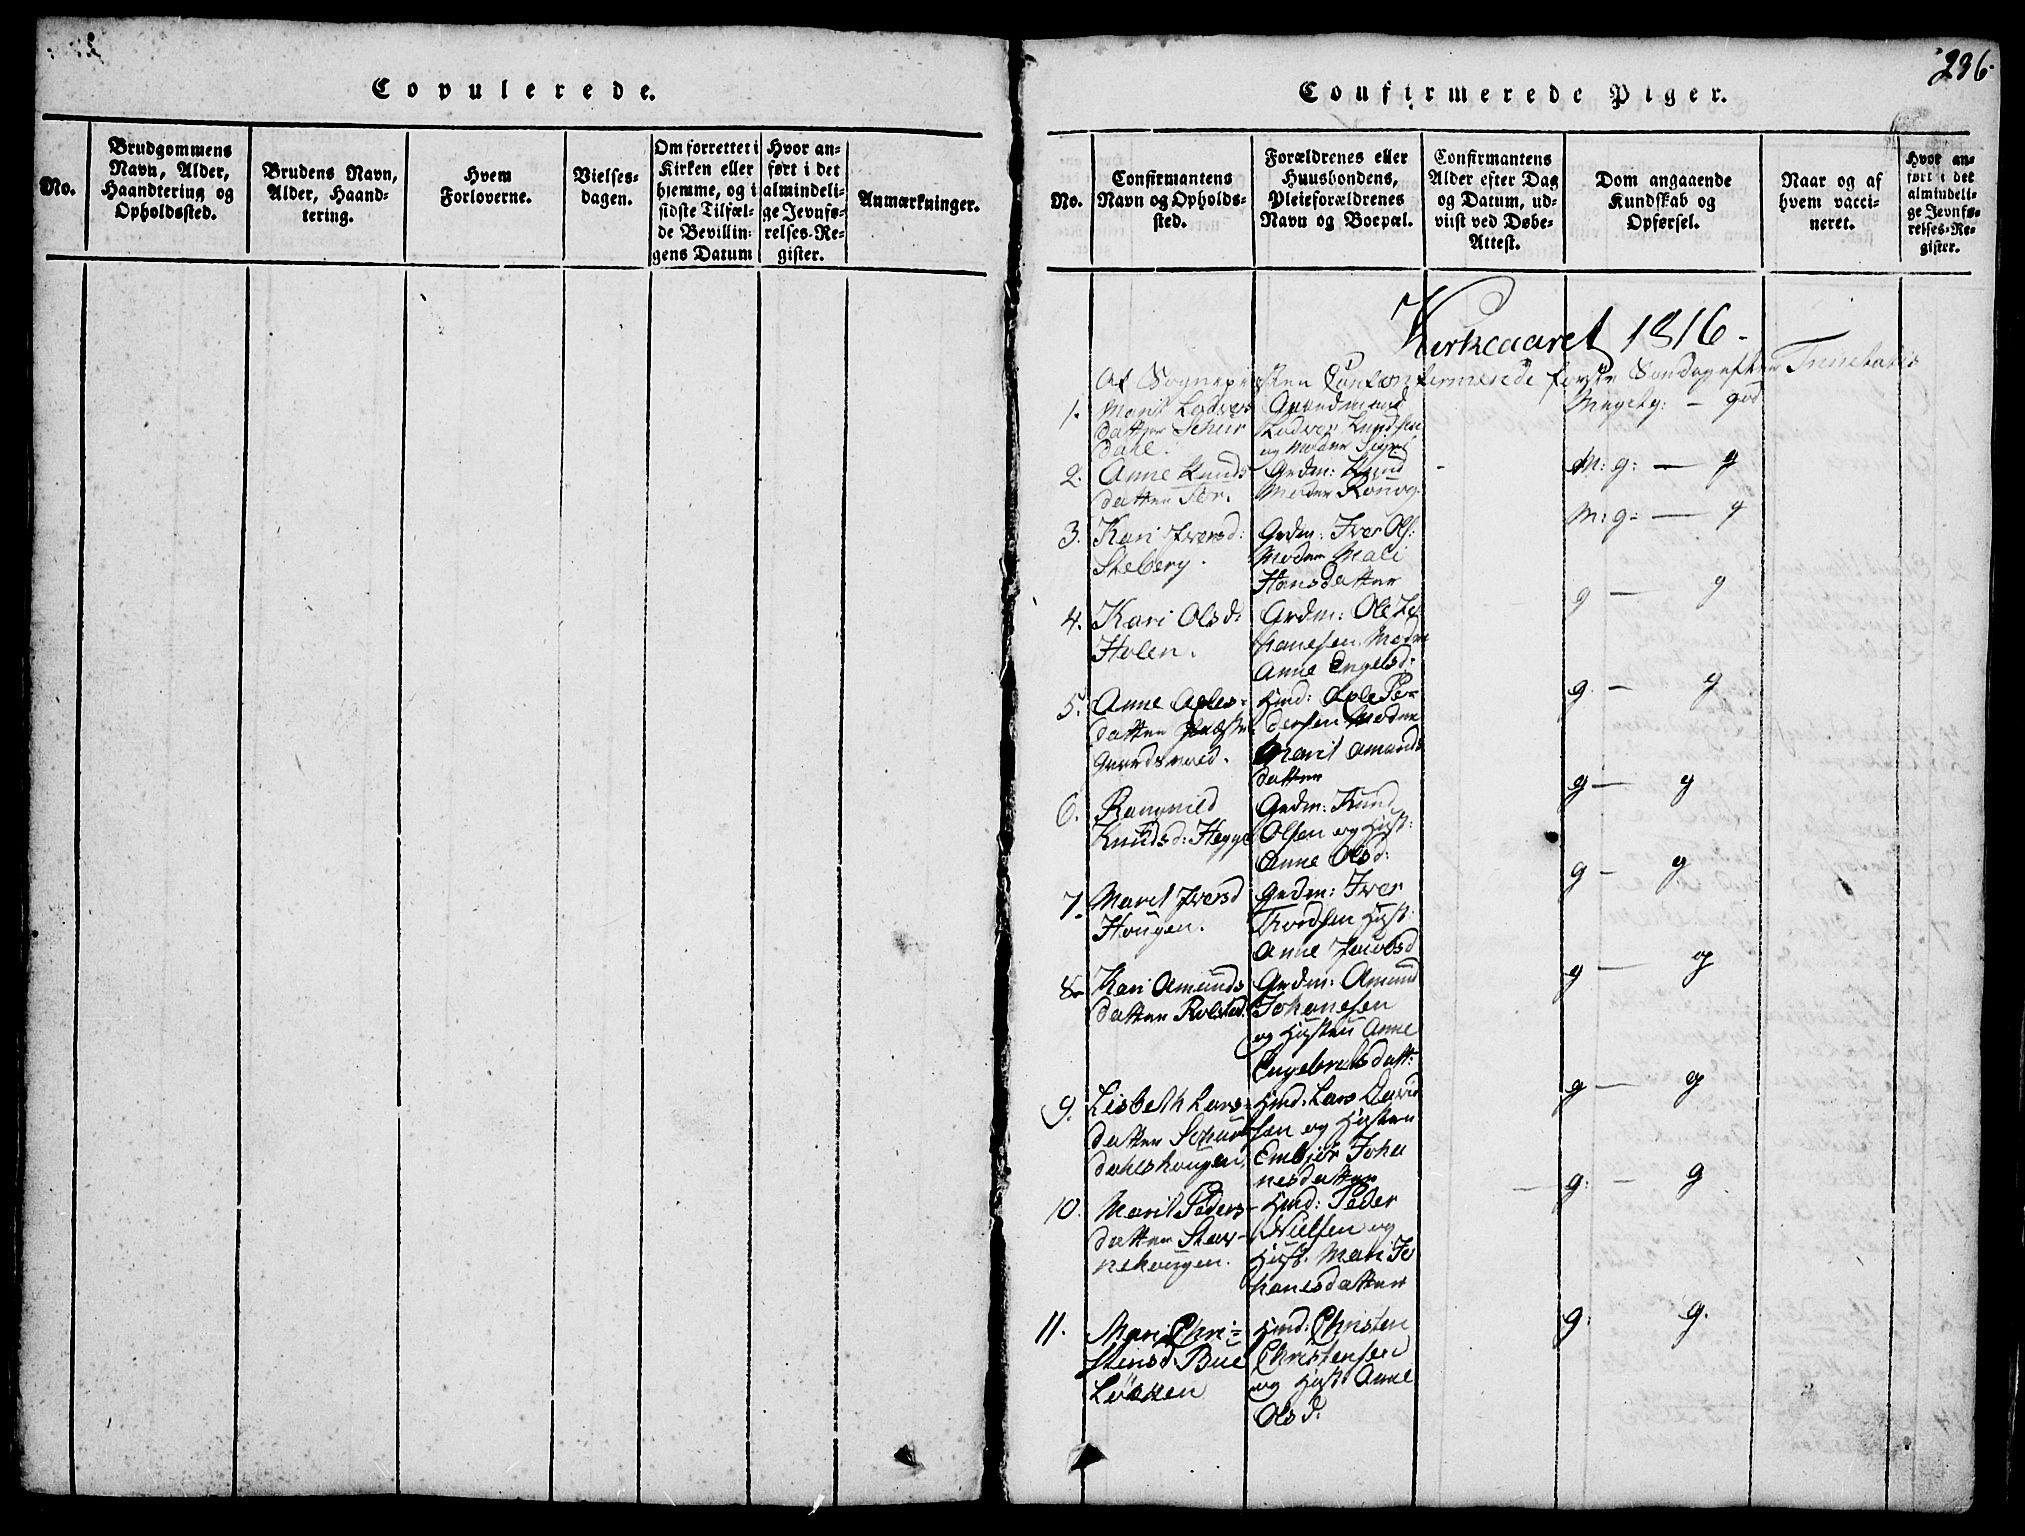 SAH, Fron prestekontor, H/Ha/Hab/L0001: Klokkerbok nr. 1, 1816-1843, s. 236